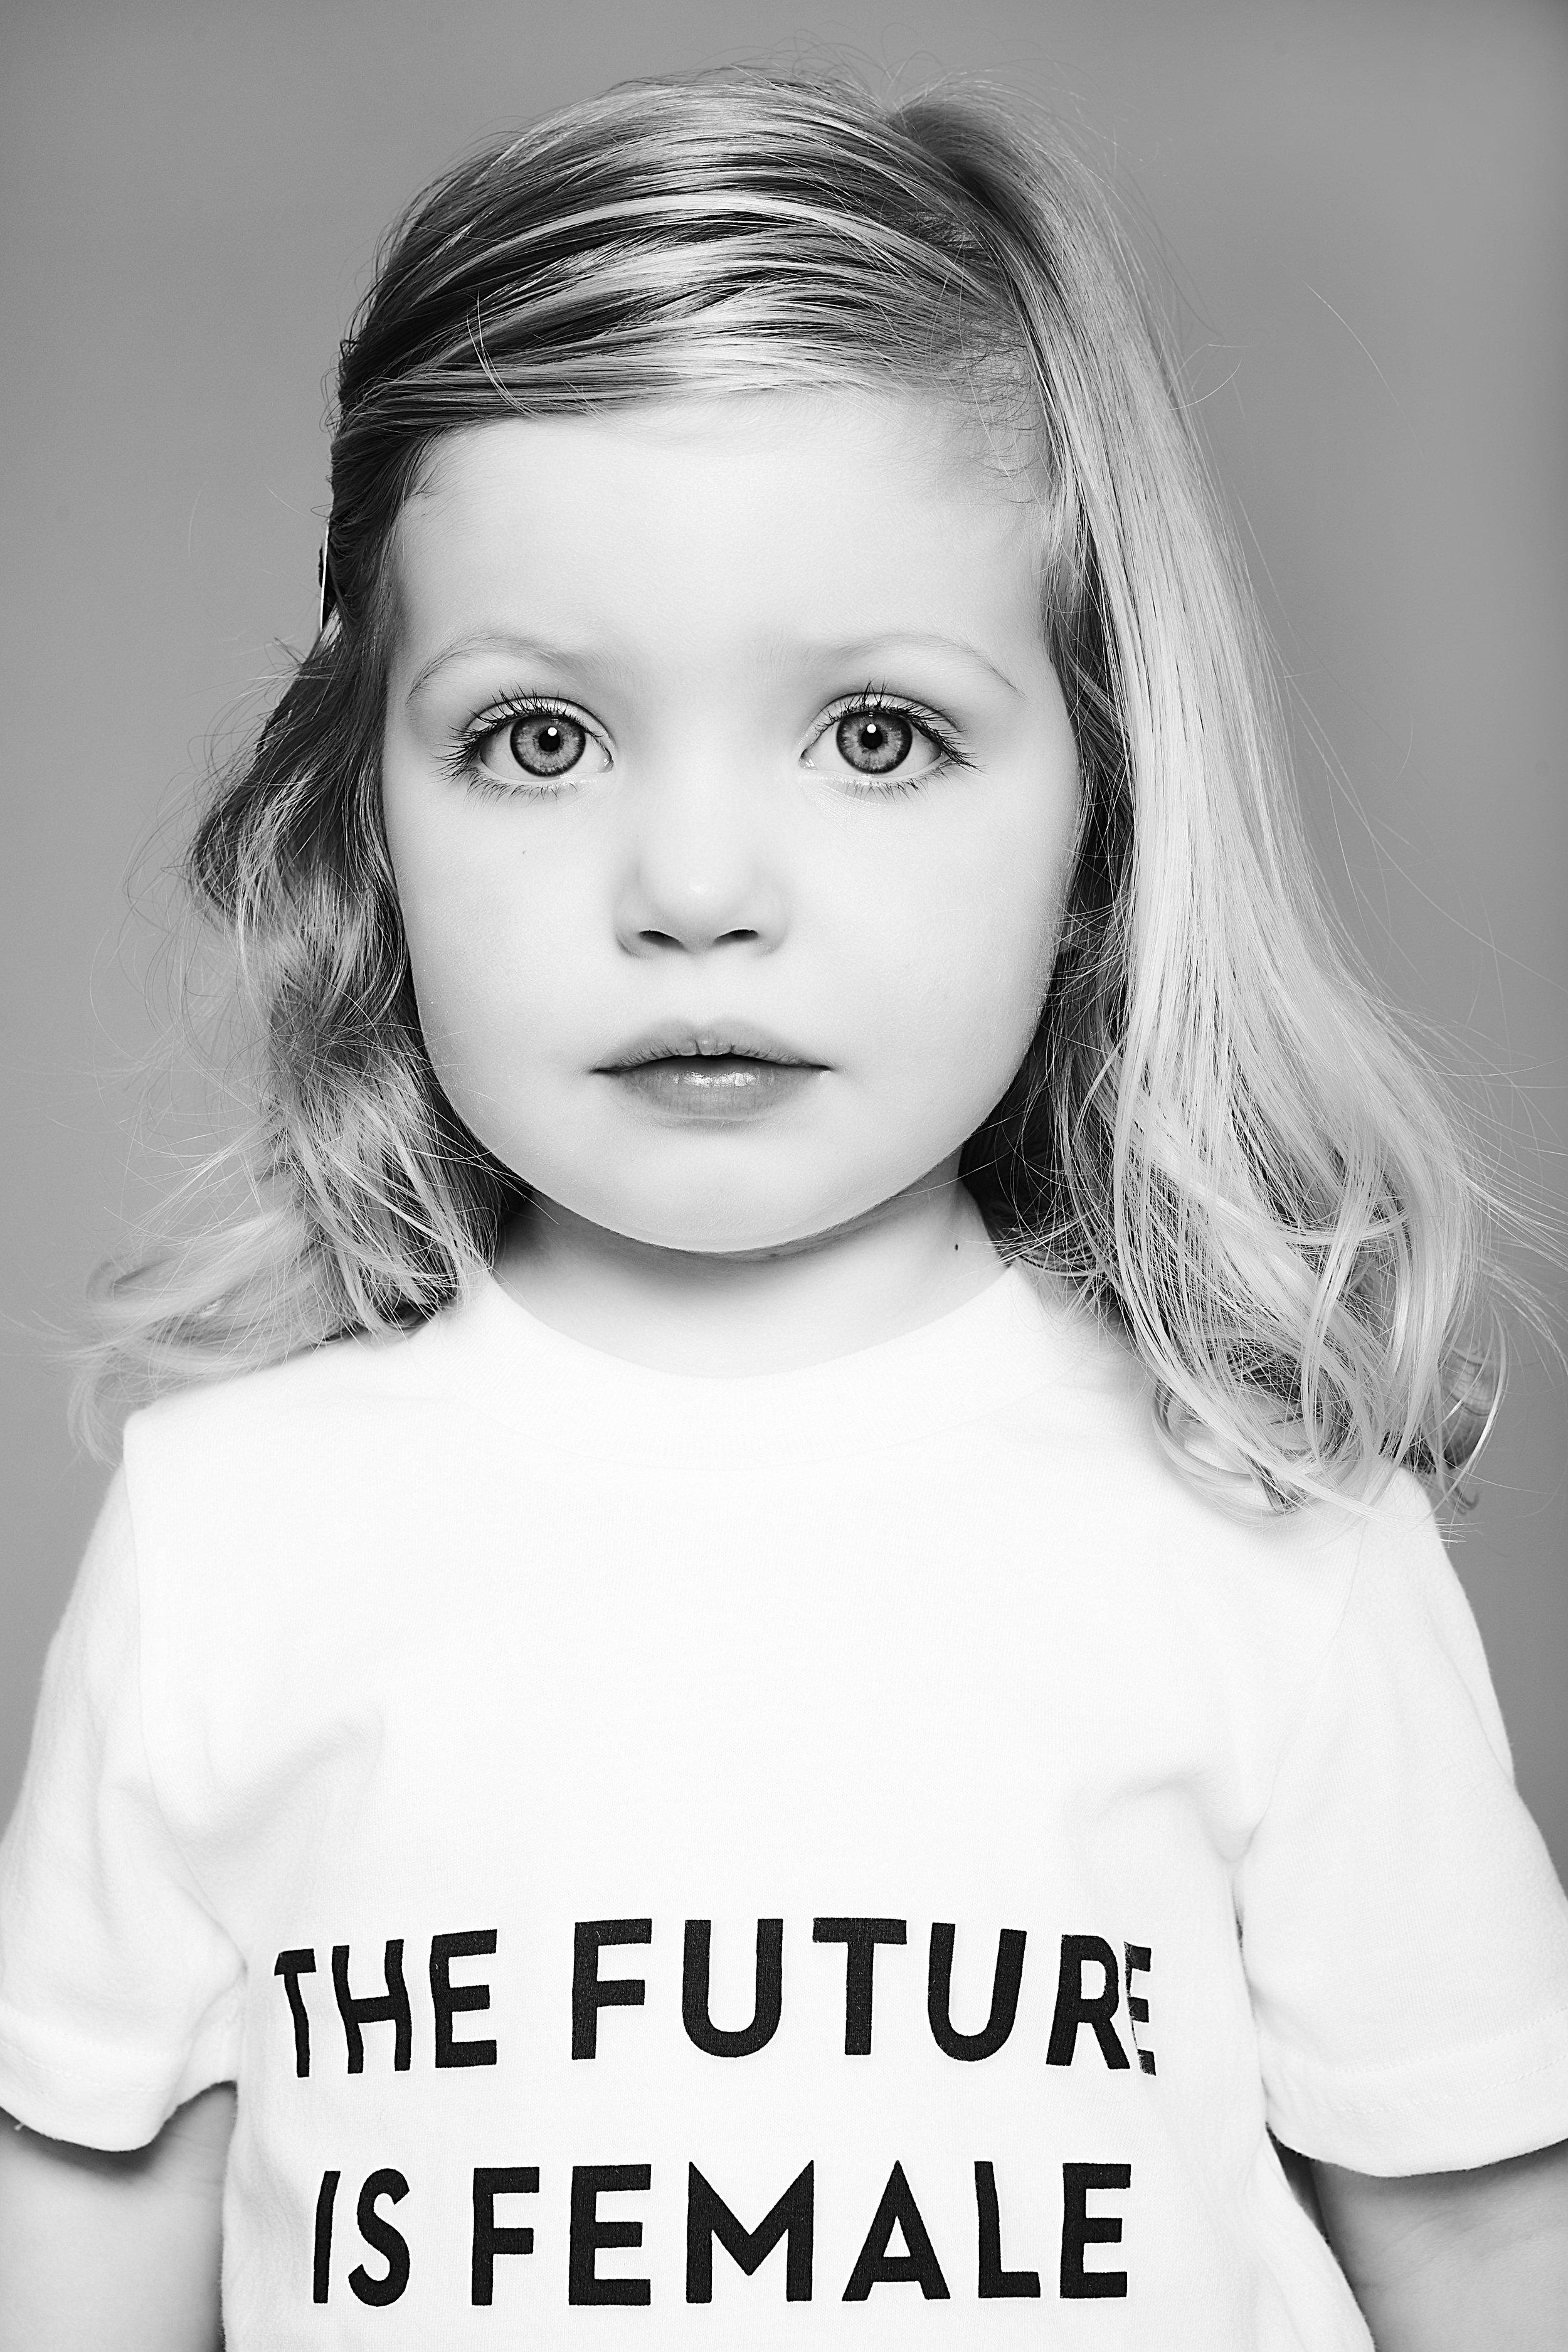 2017_the_future_is_female_008_bw_r.jpg